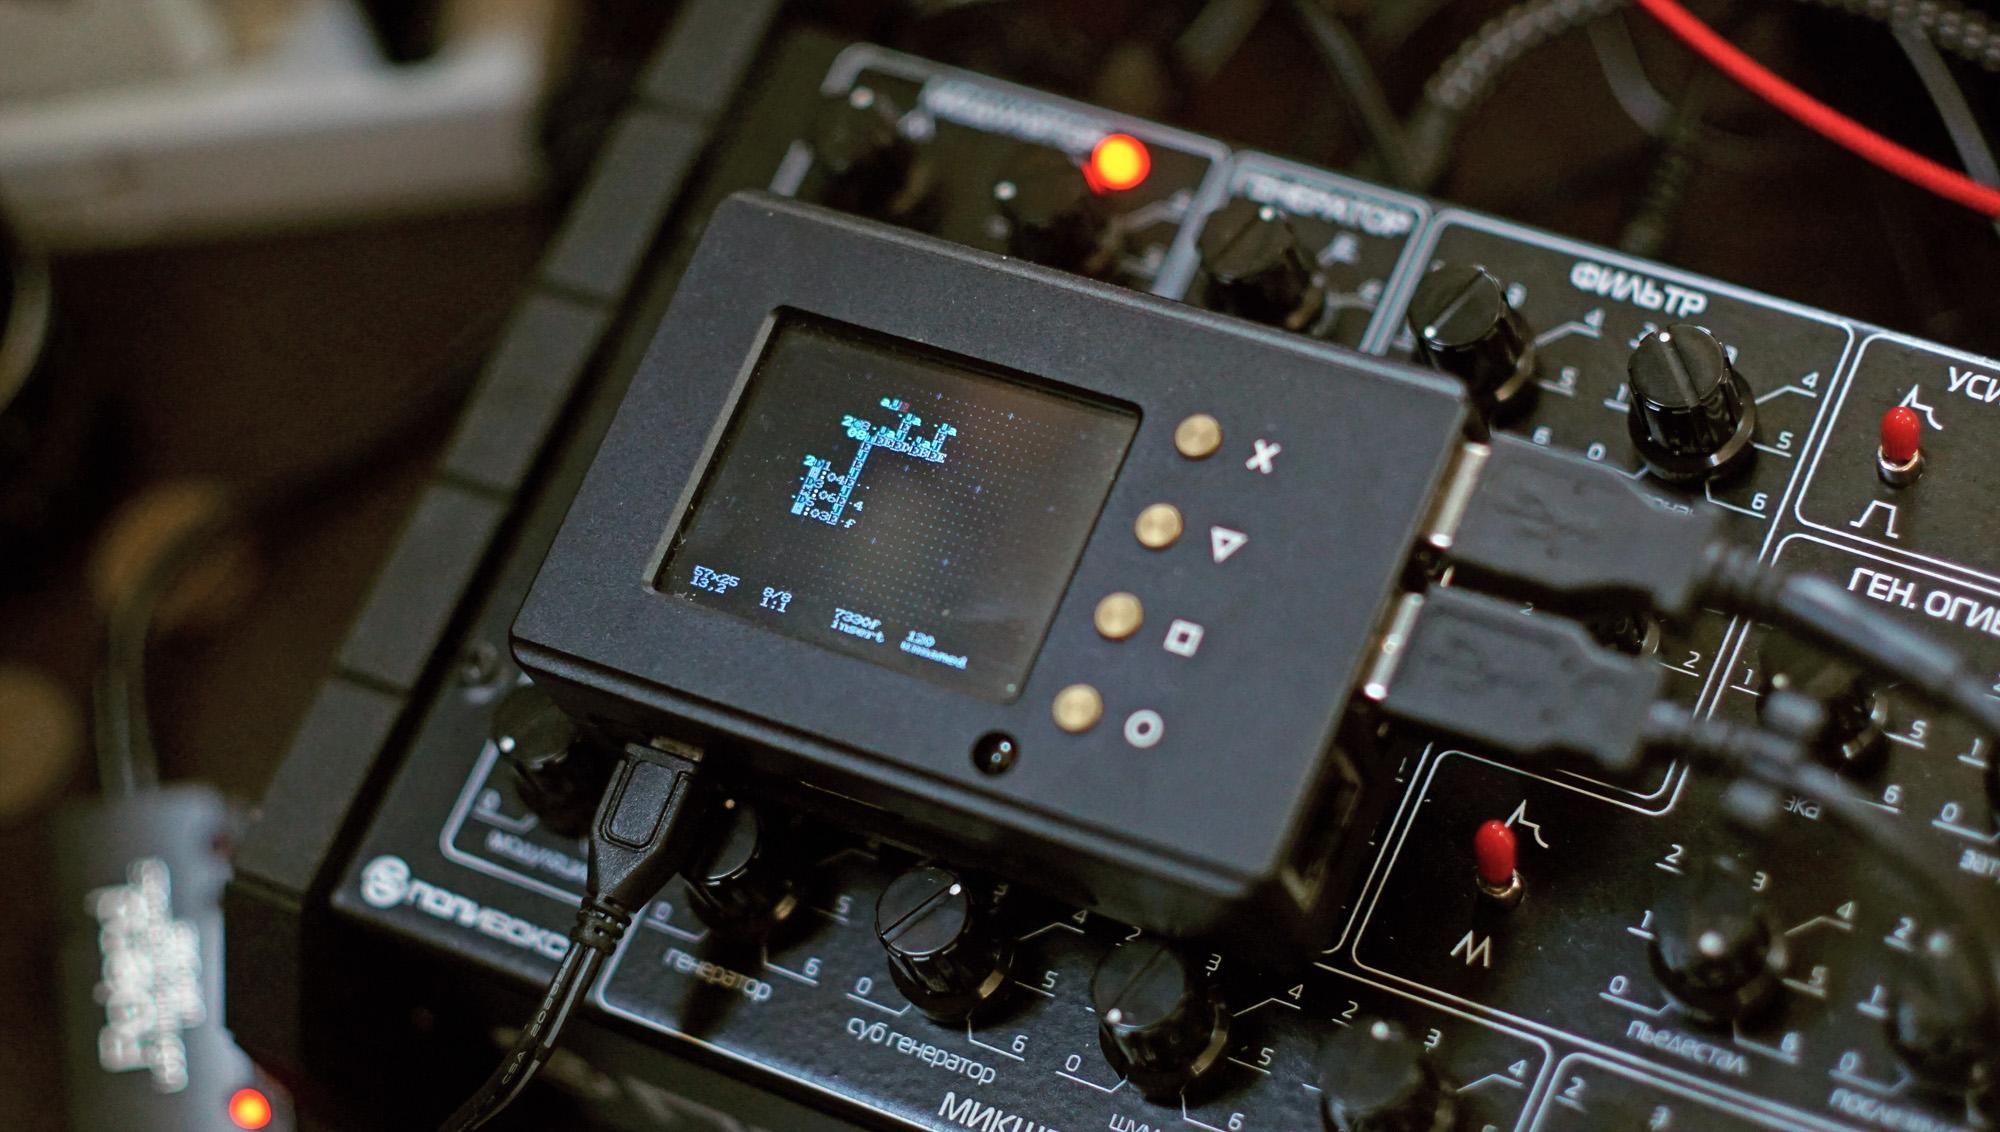 Orca - Livecoding Tool - Equipment - lines